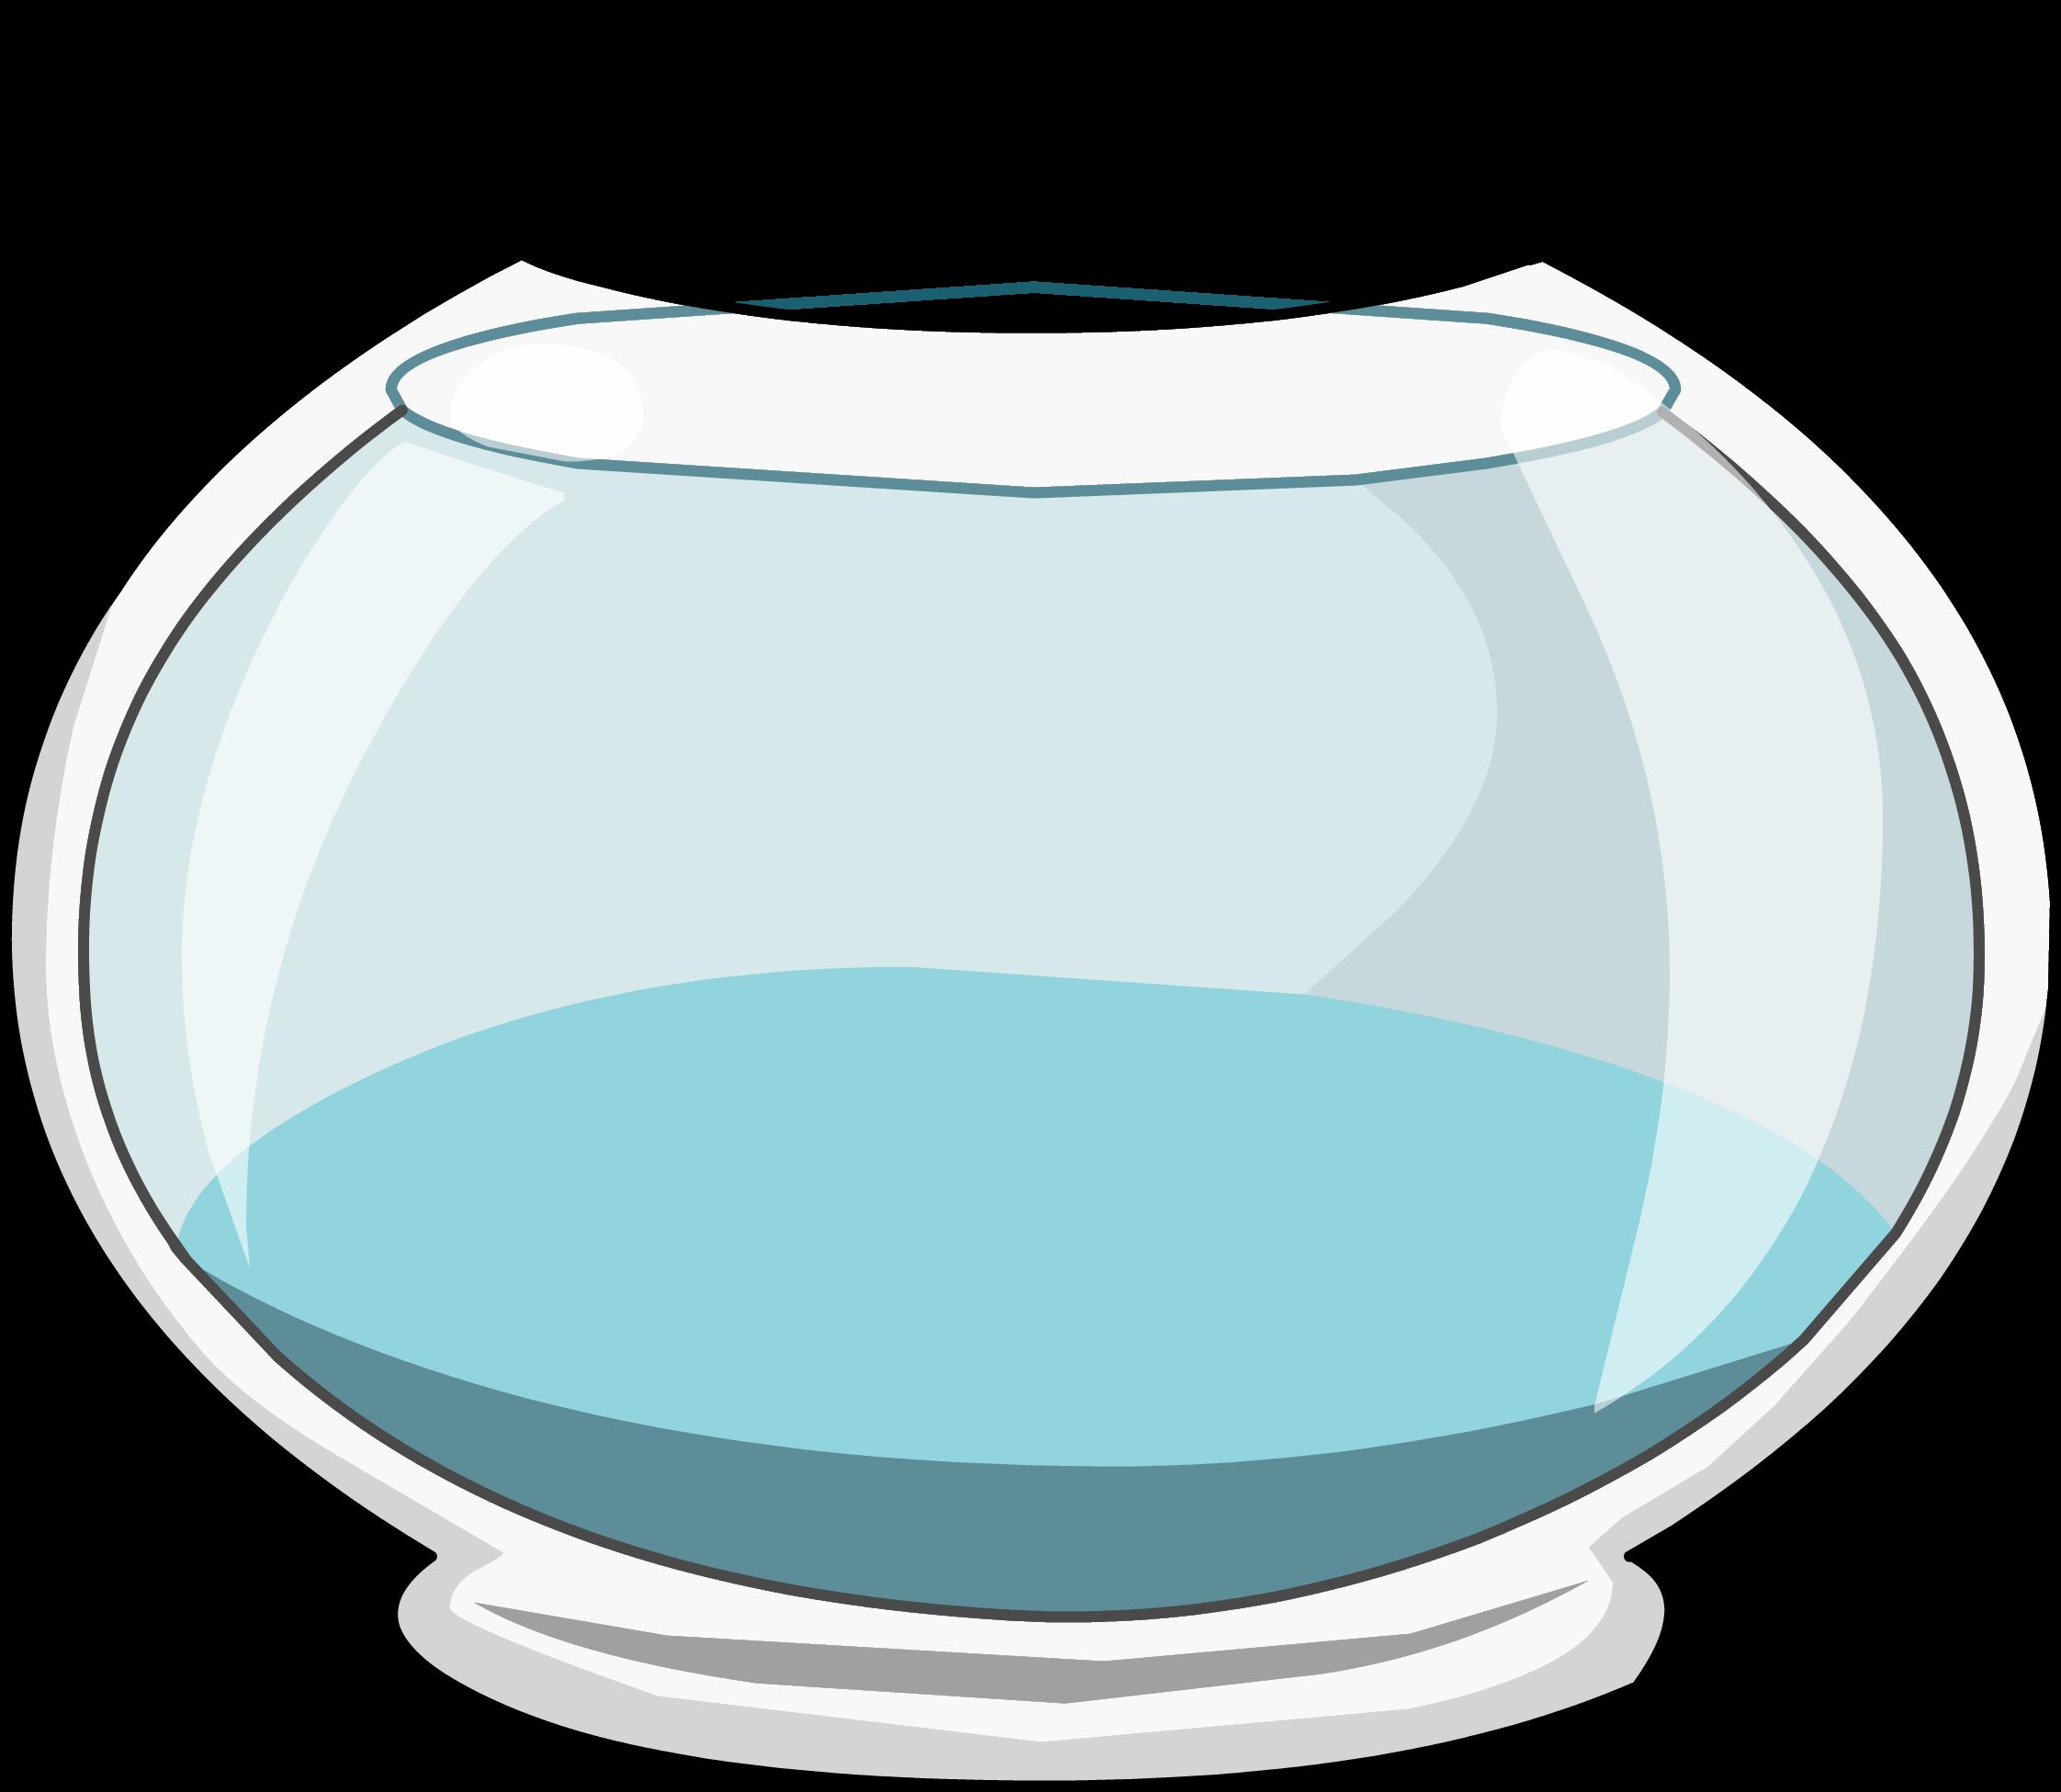 Fish bowl images clipart